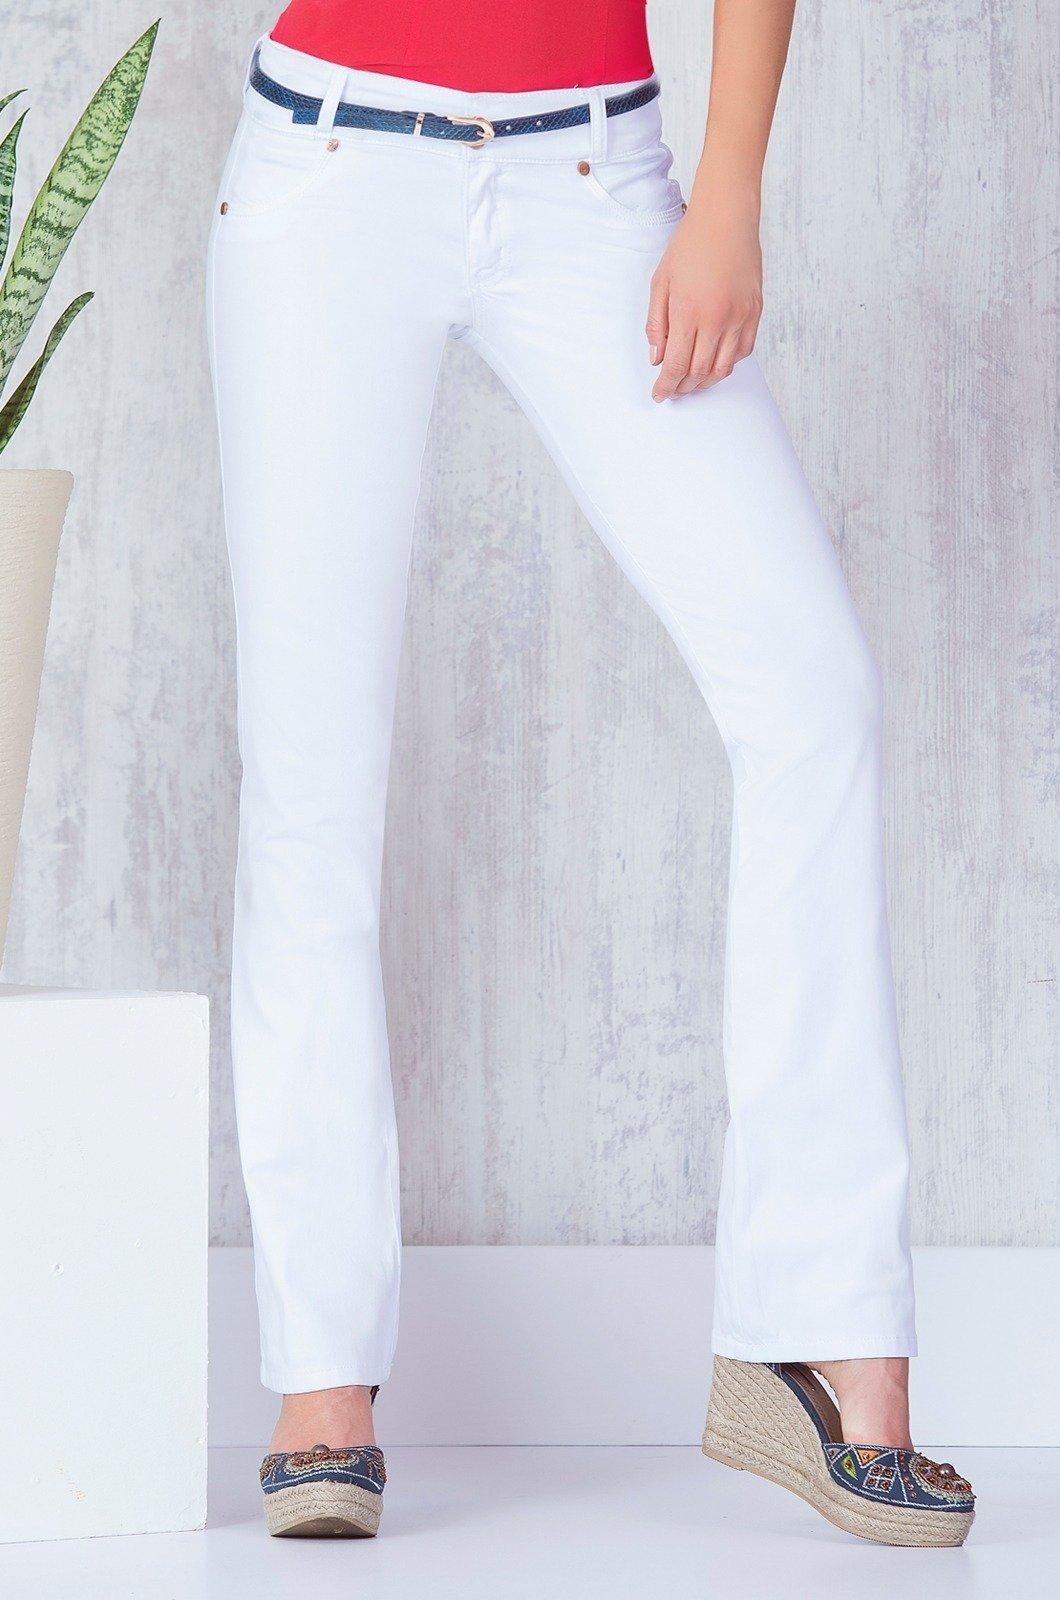 Skinny Jean Blanco - Chazari 1314-9